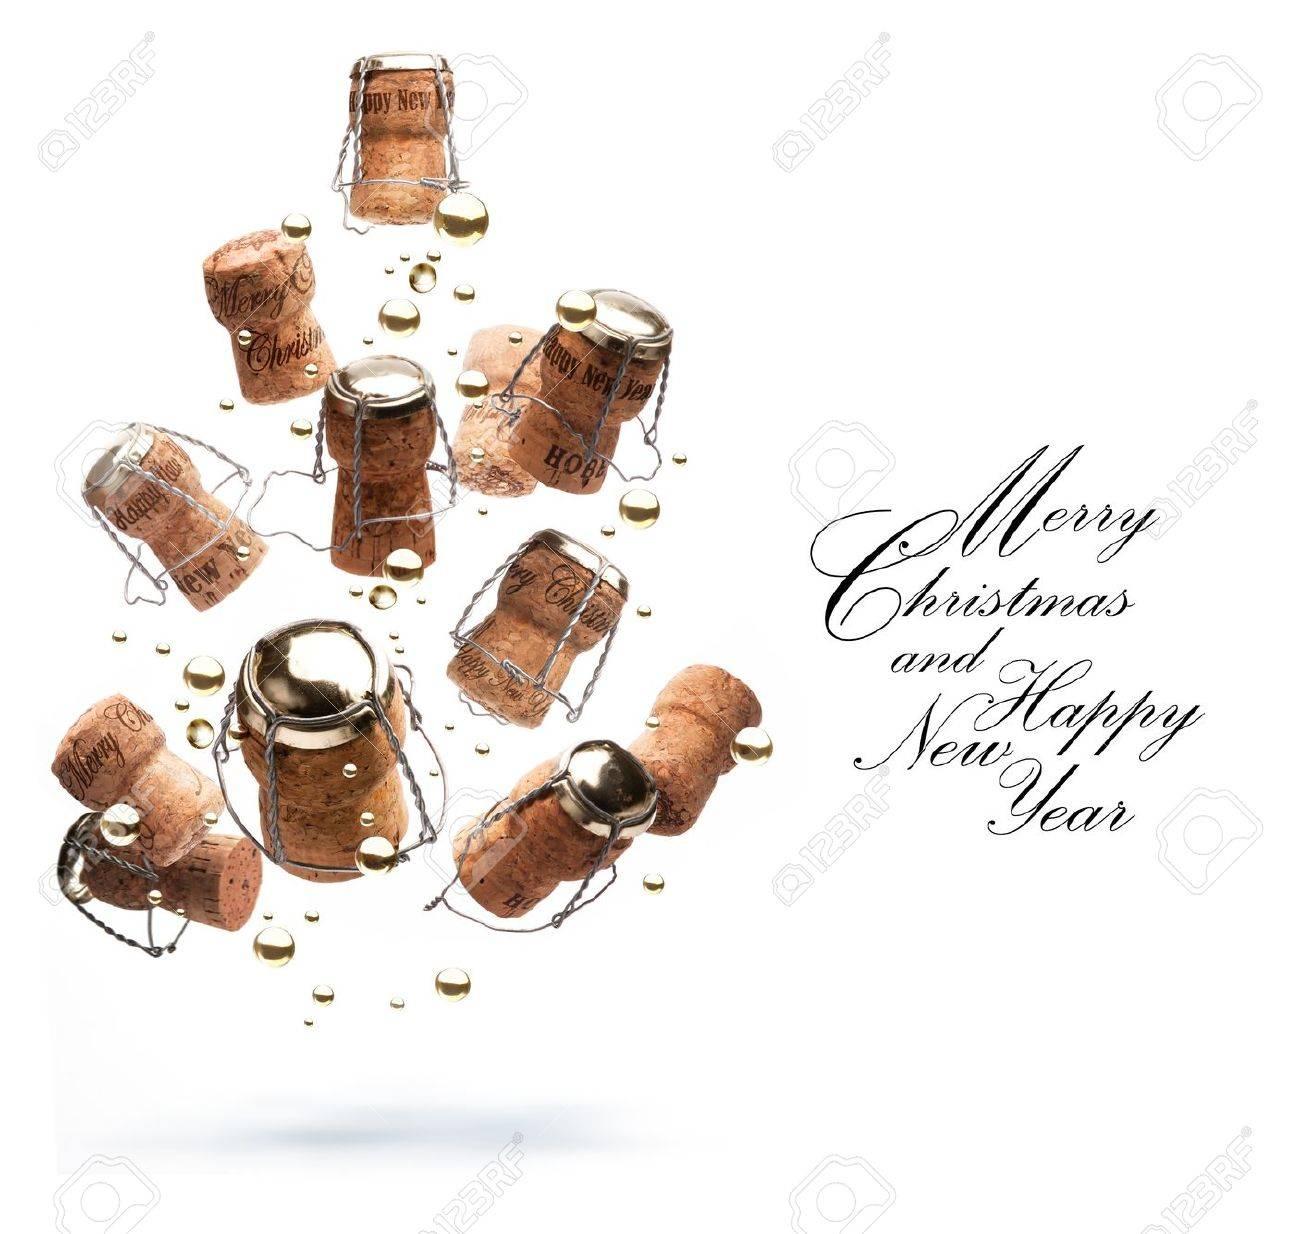 Art Christmas greeting card Stock Photo - 10460769